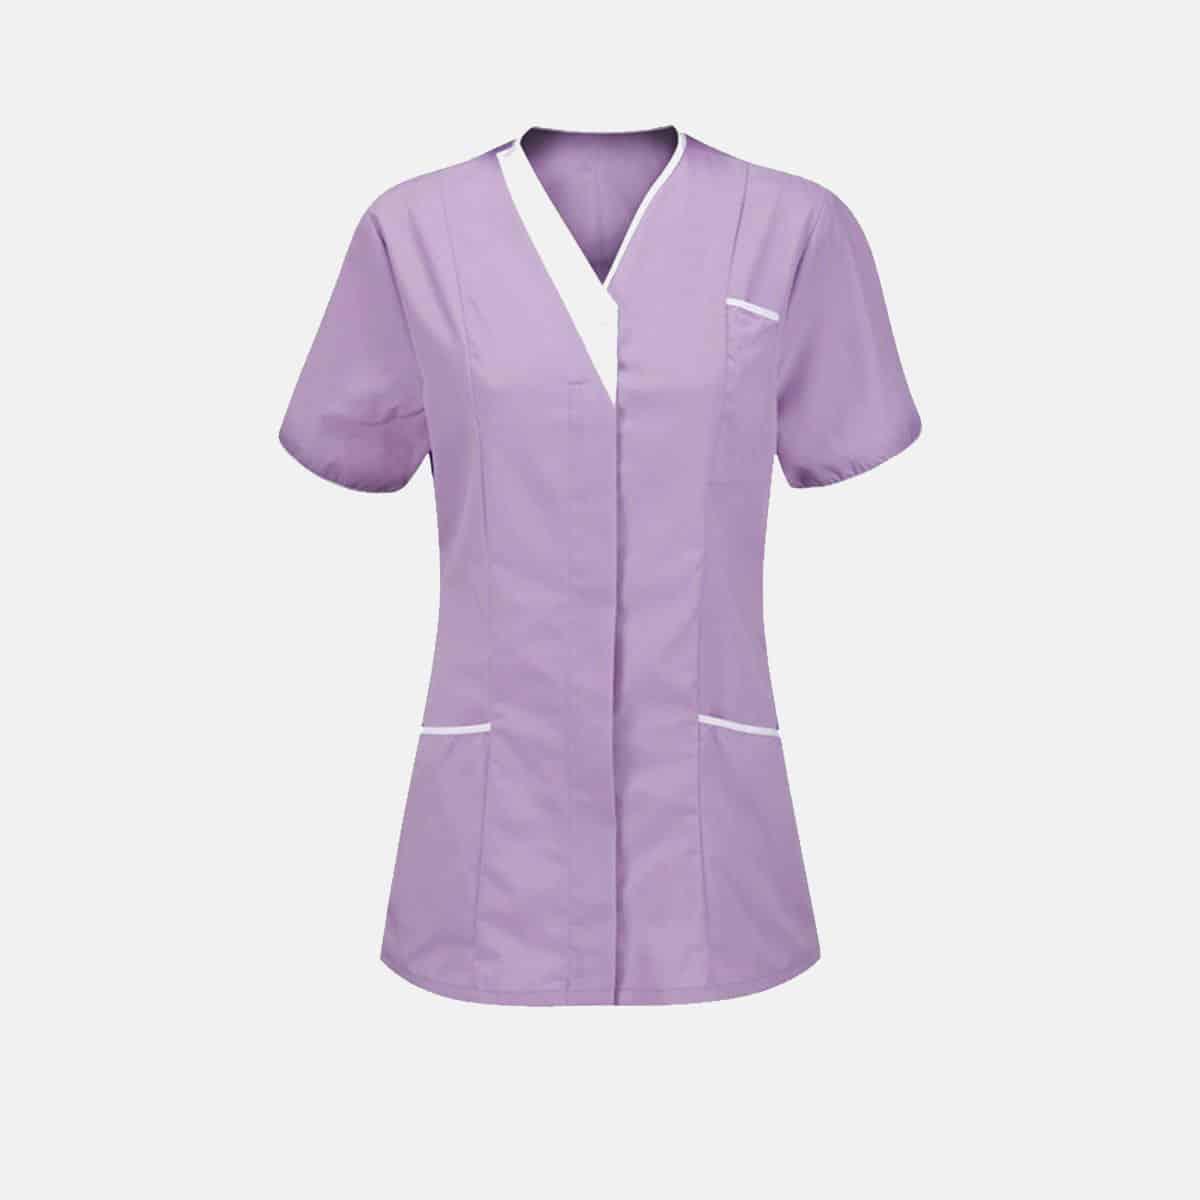 Nurses V Neck Healthcare Tunic Therapist Dentist Uniform